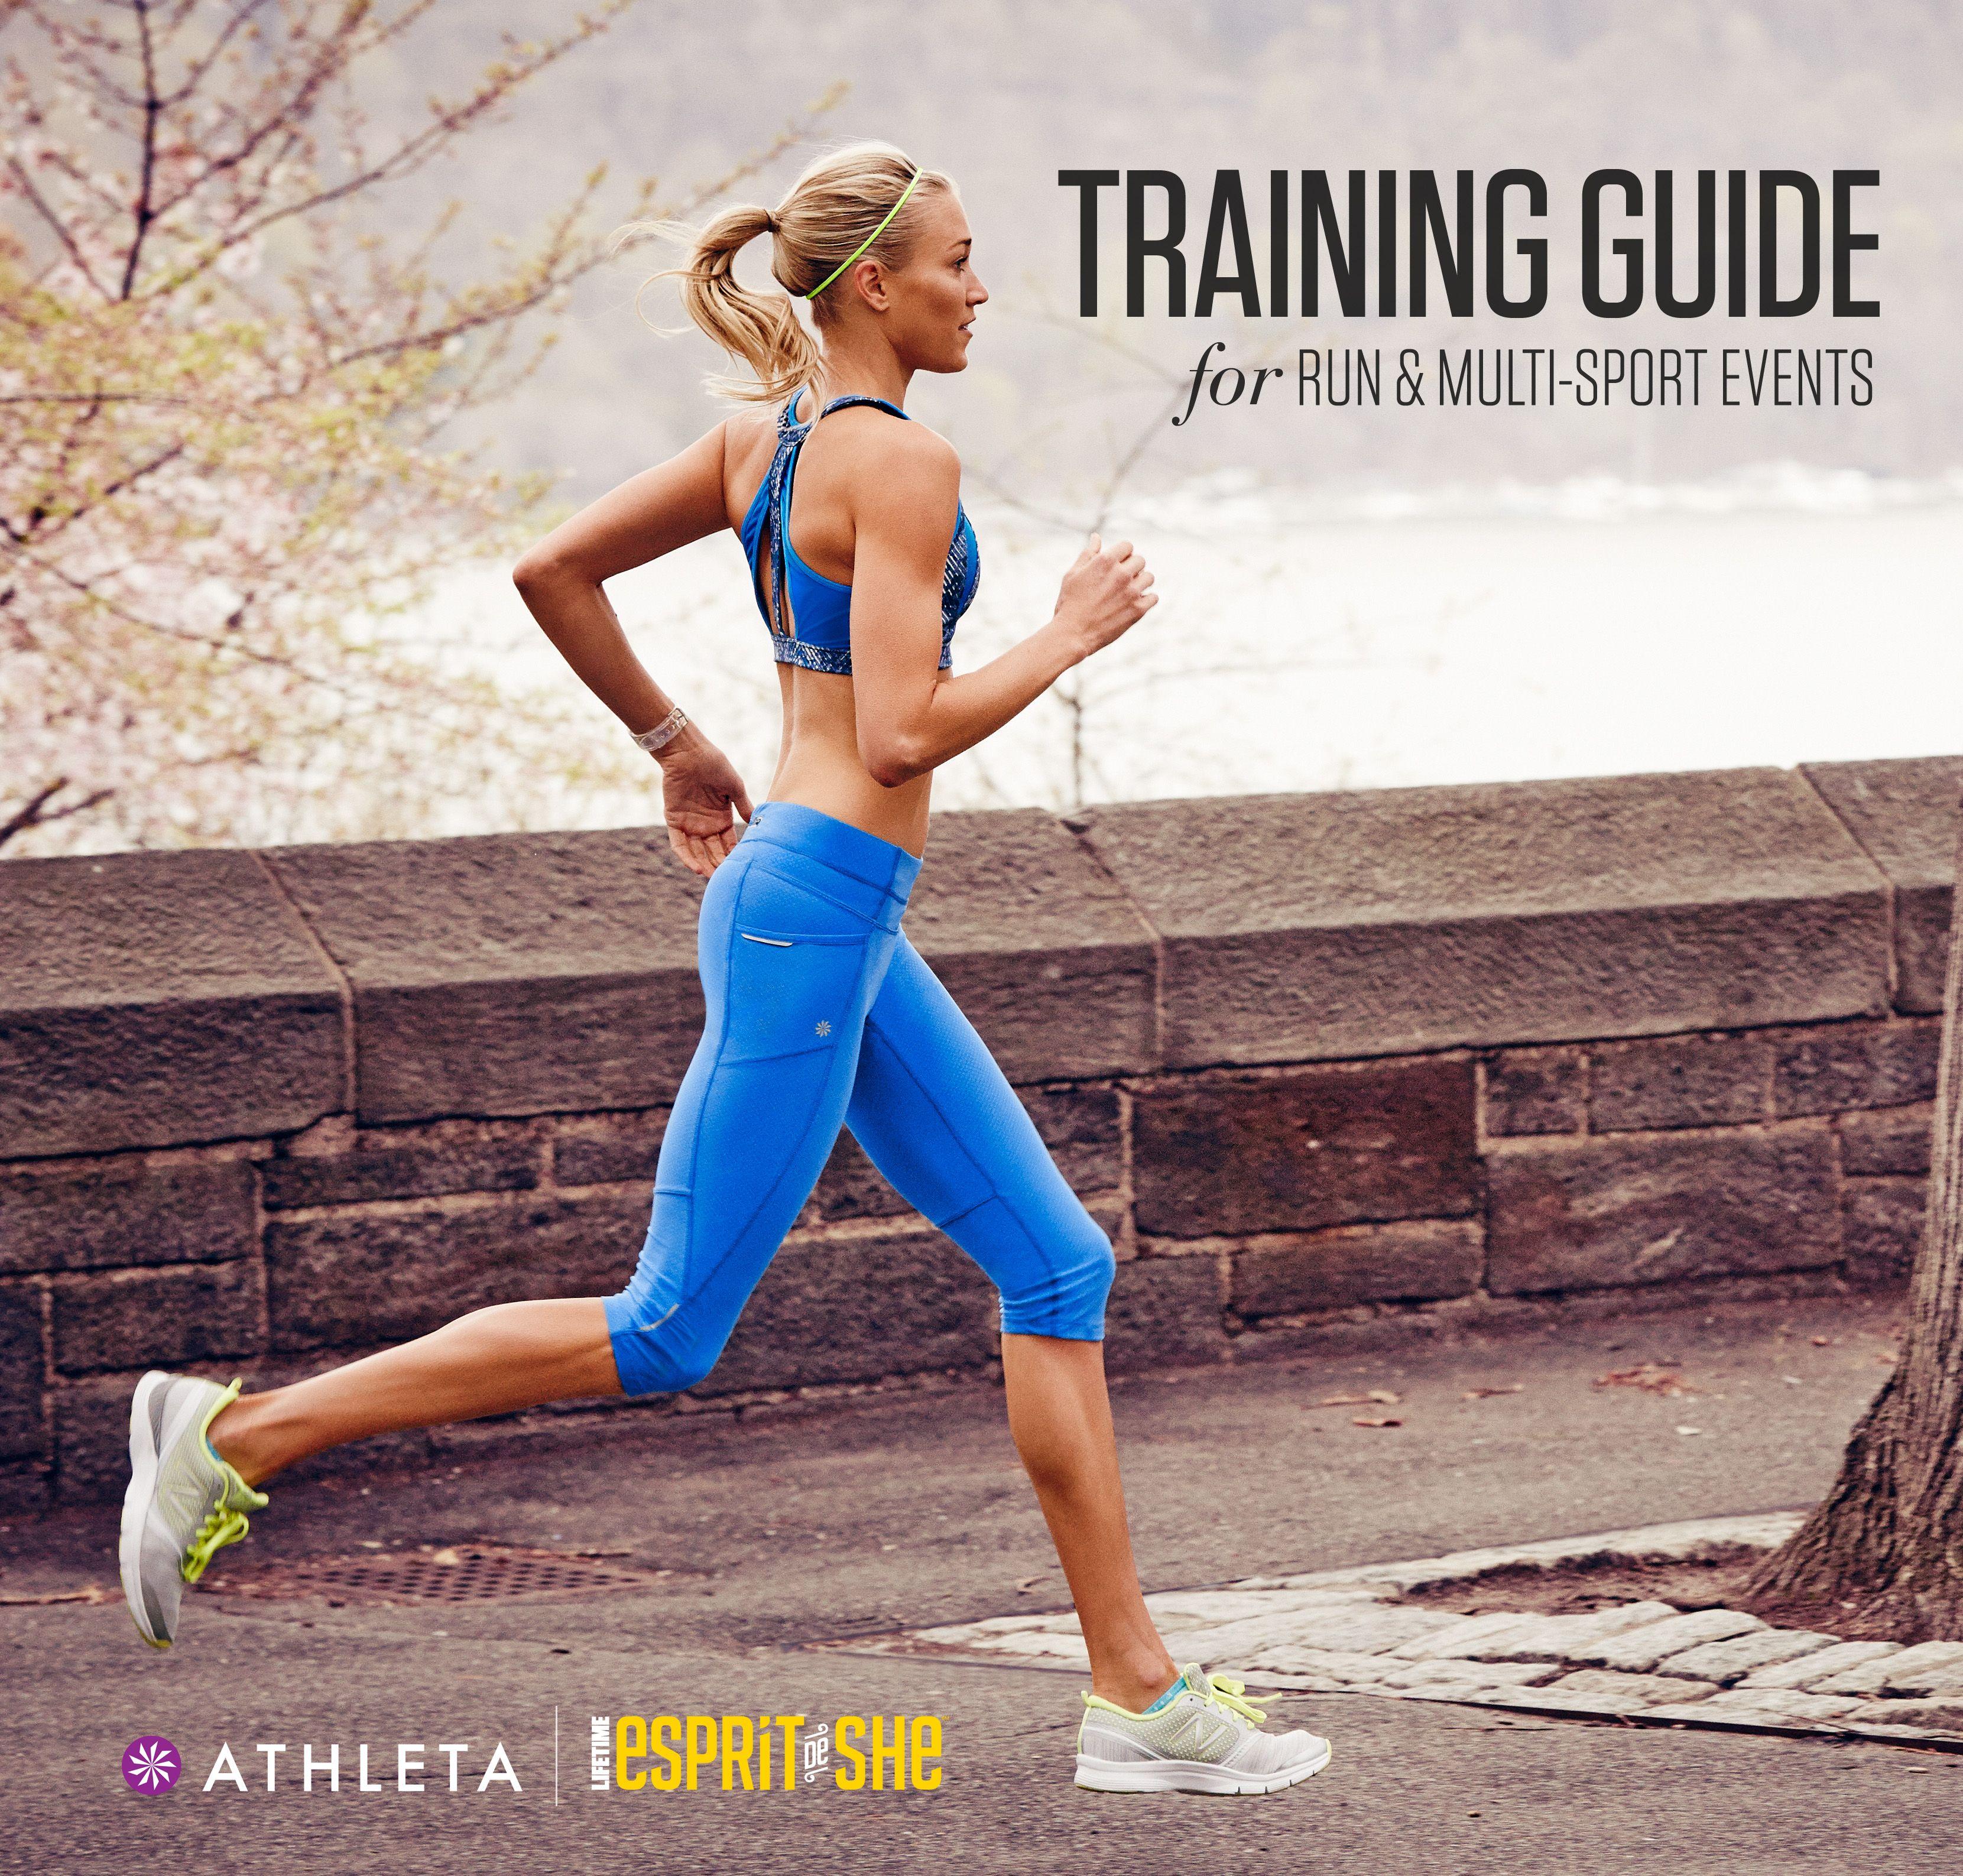 Free Training Guide For 5k 10k Half Marathon Sprint Triathlon And Duathlon Events From Athleta A Fitness Event Duathlon Training Sprint Triathlon Training